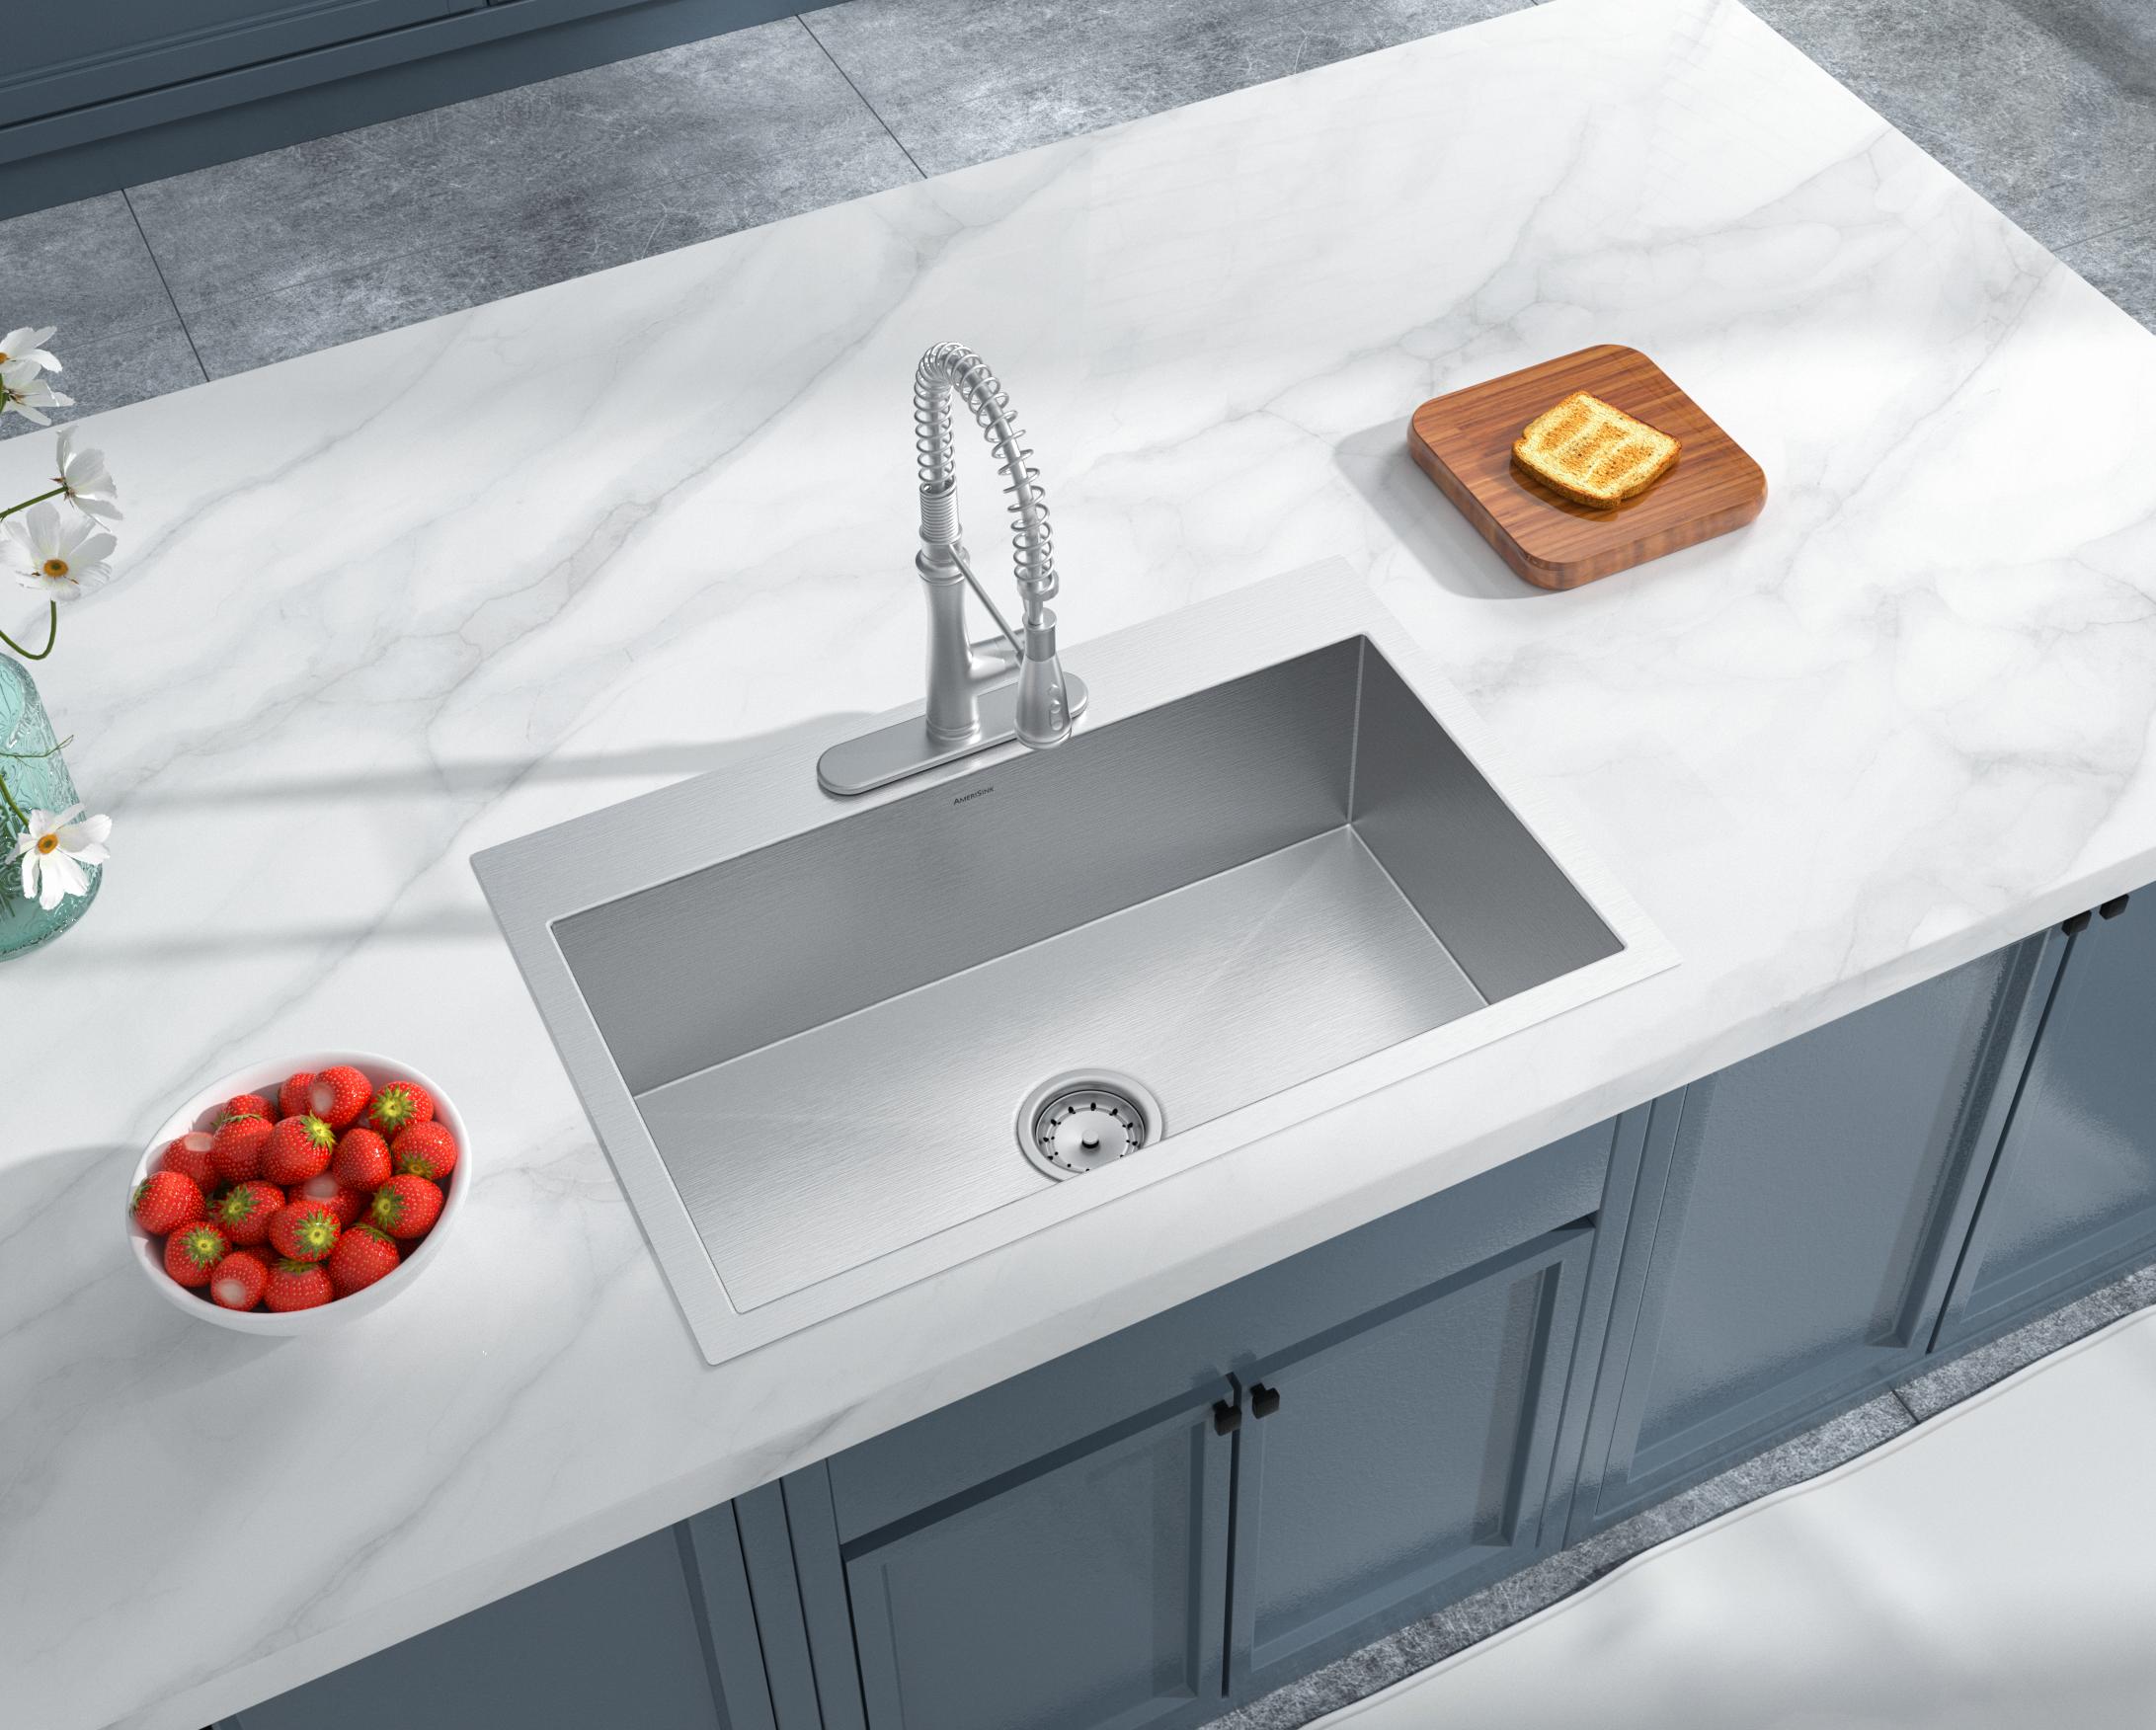 As325 33 X 22 X 10 16g Single Bowl Dual Mount Legend Stainless Steel Kitchen Sink Amerisink